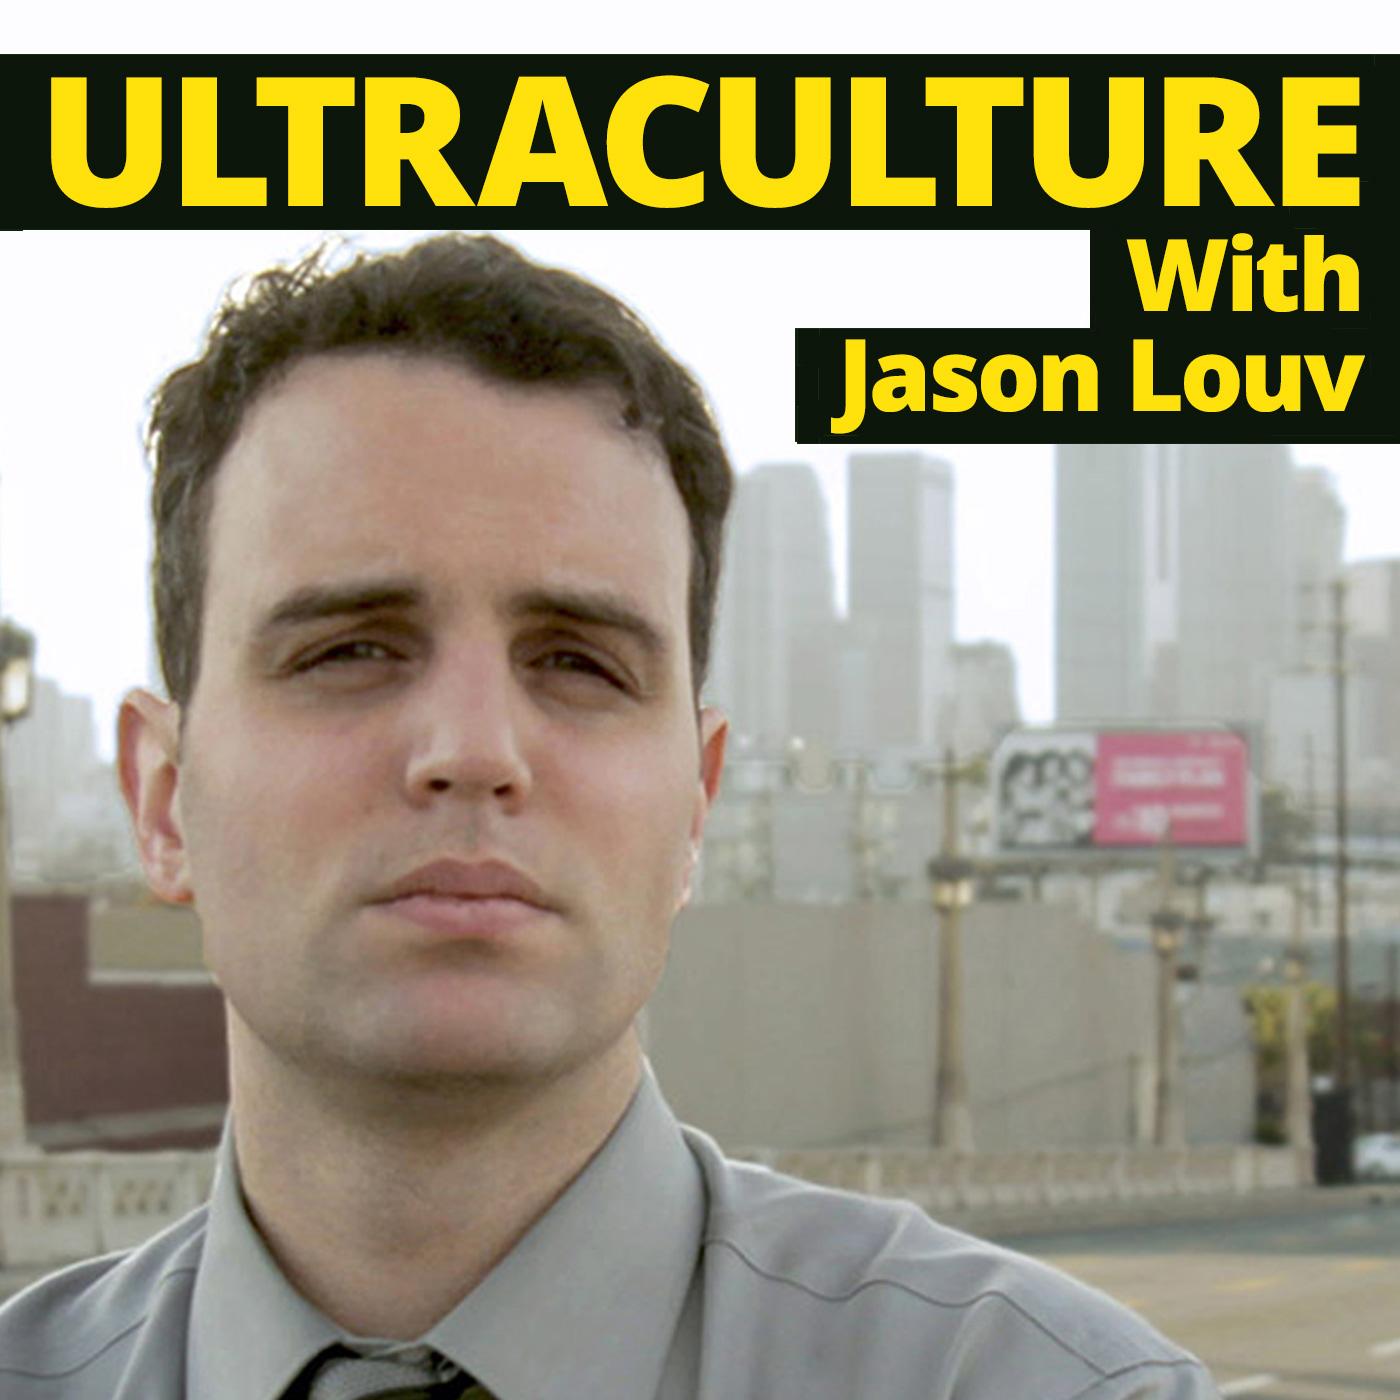 Ultraculture With Jason Louv show art